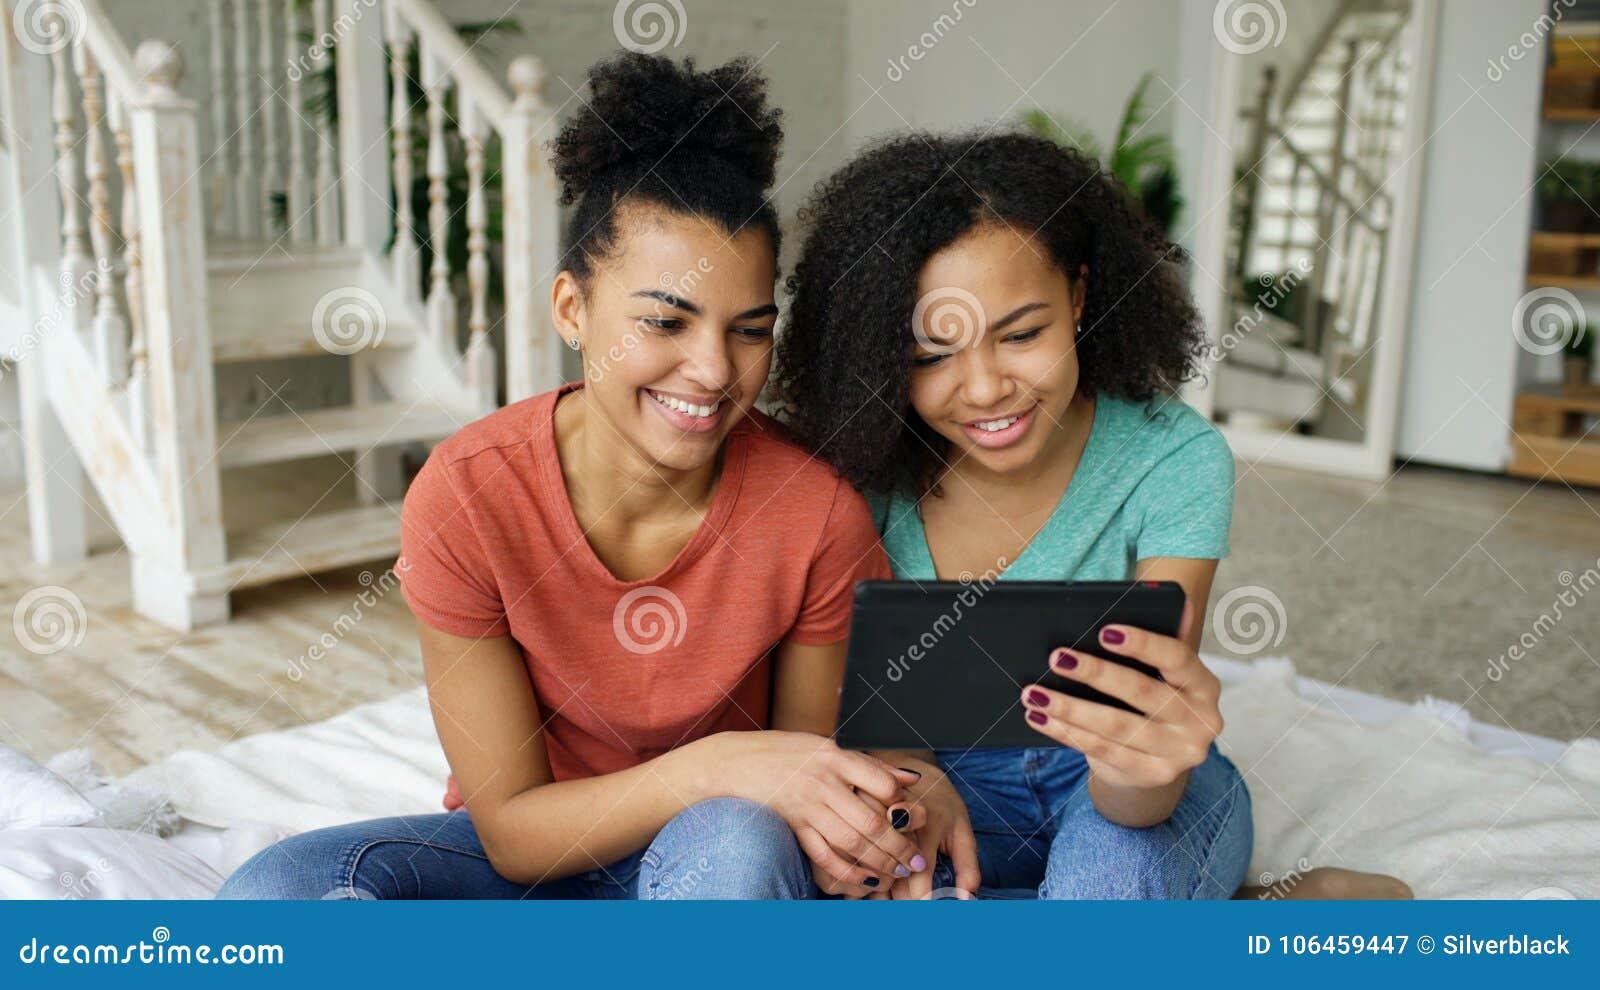 Best Free Lesbian Porn Site